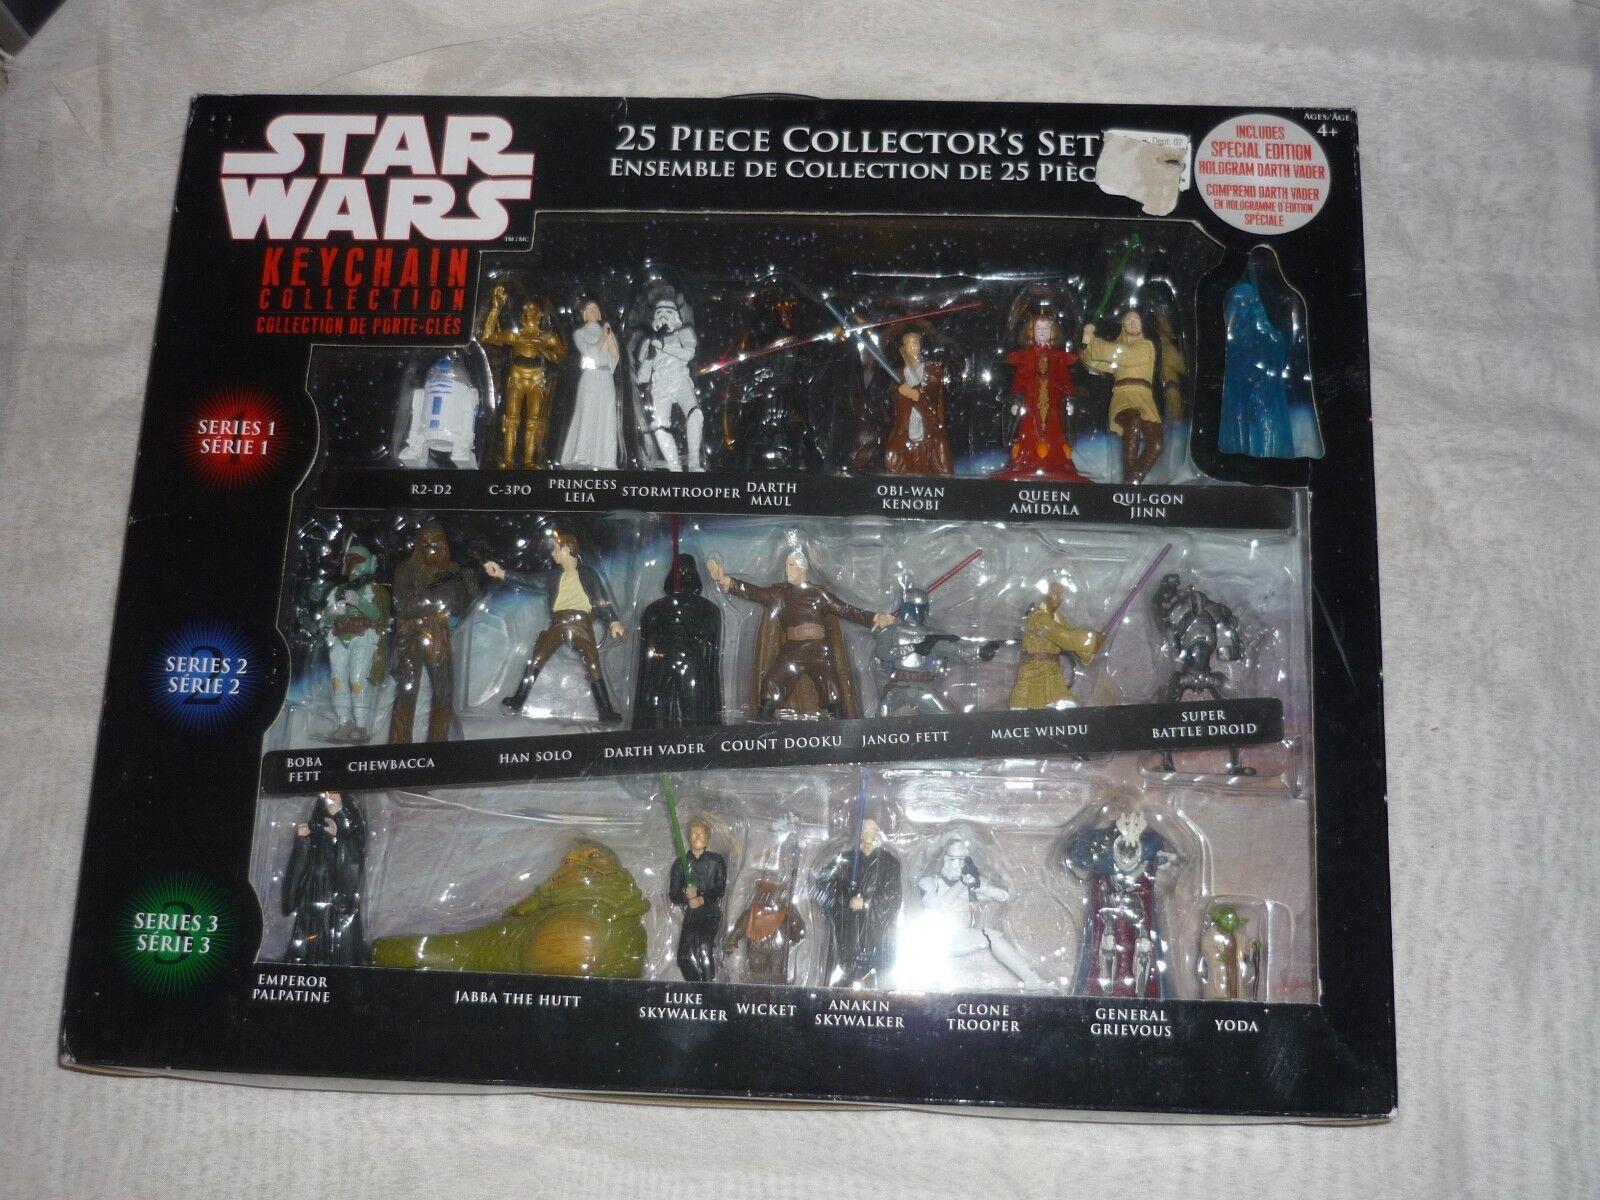 HUGE 25pc STAR WARS Keychain Collection Still in Box